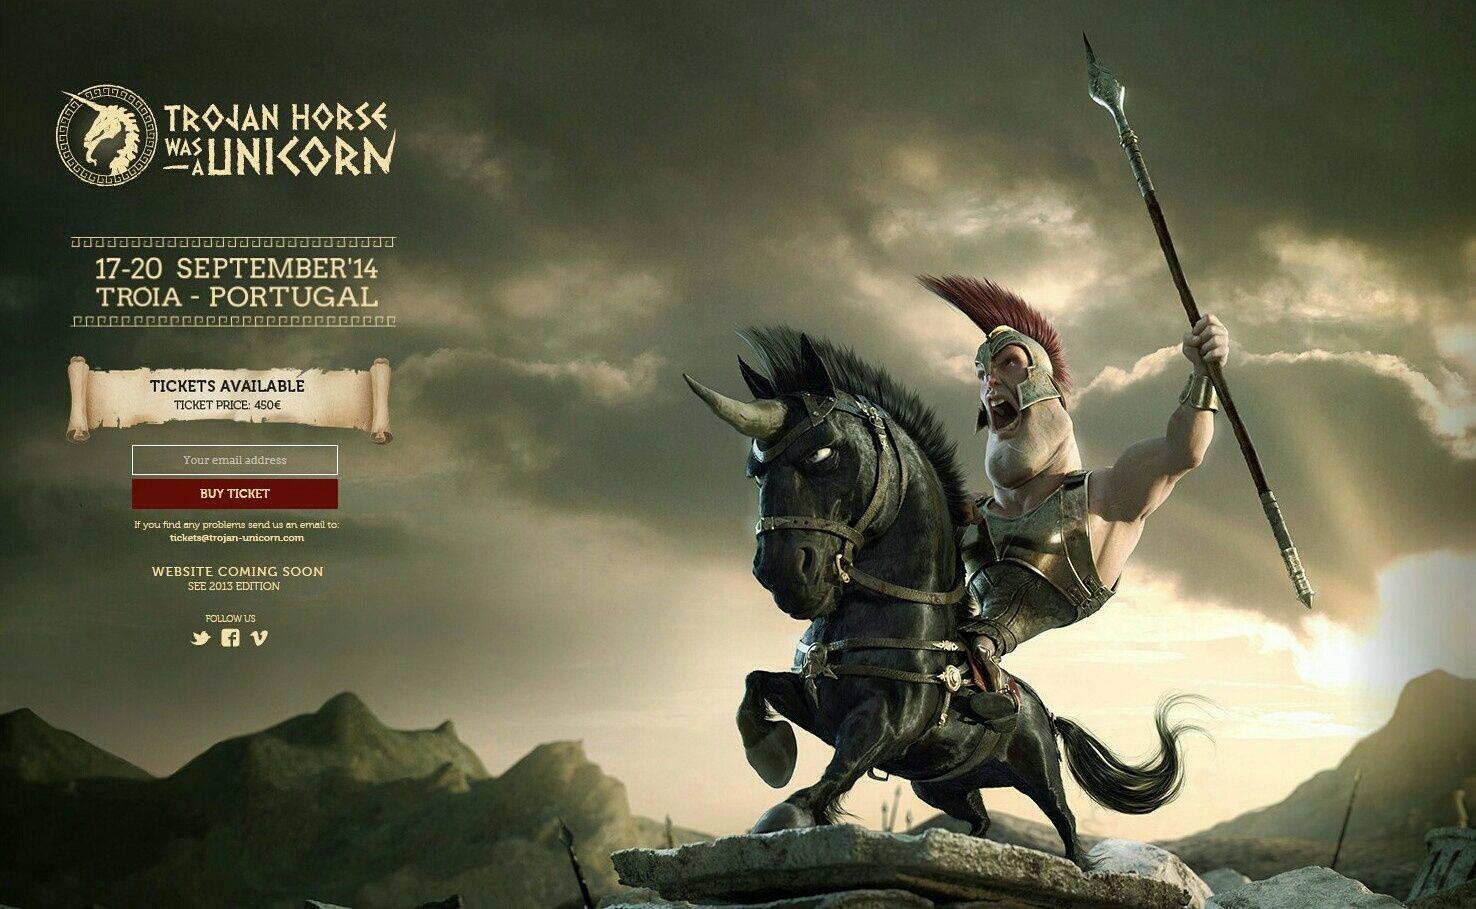 Evento Trojan Horse Was an Unicorn